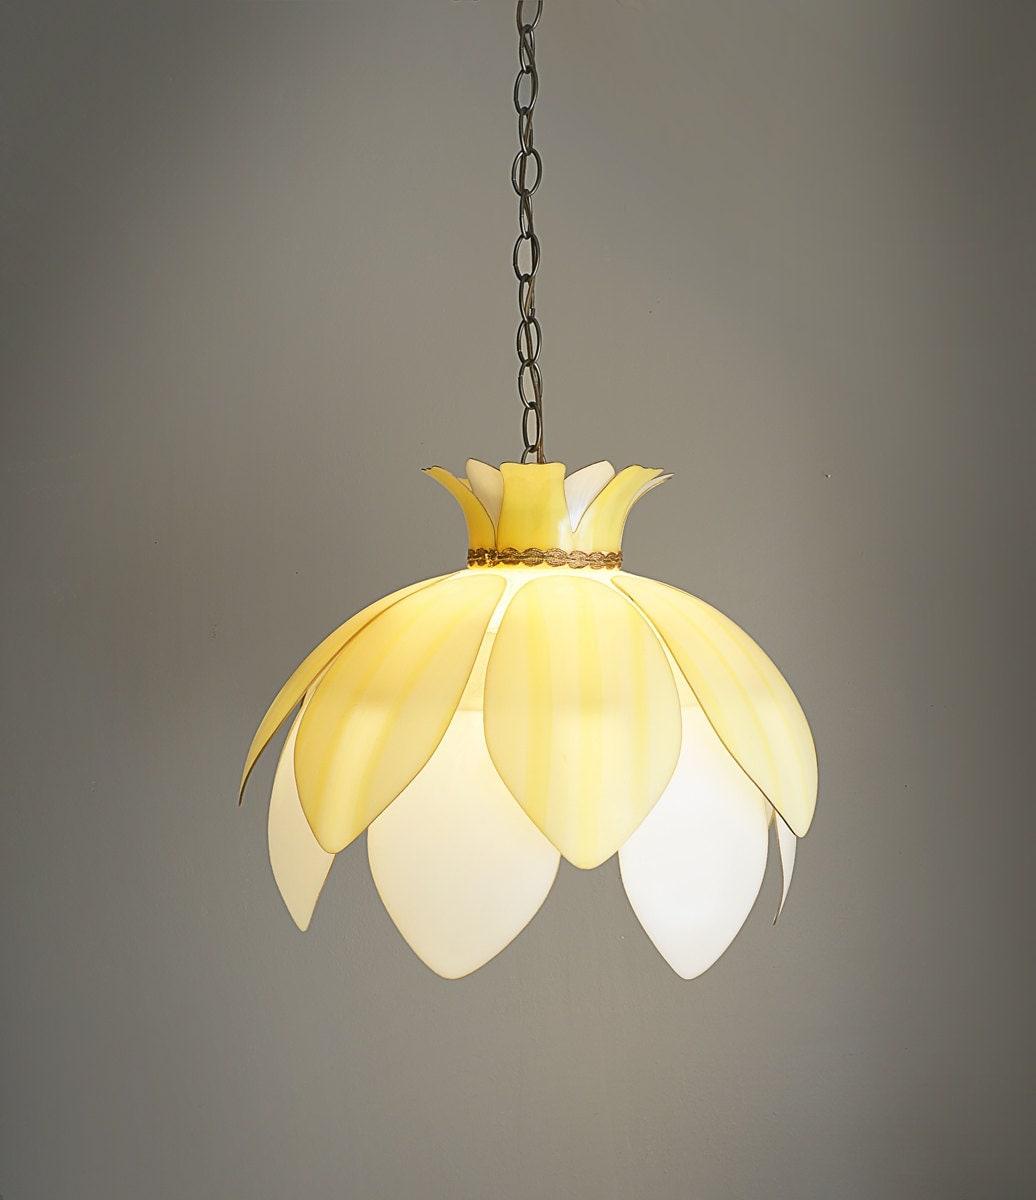 Vintage plastic flower hanging lamp light fixture yellow for Light up flower lamp